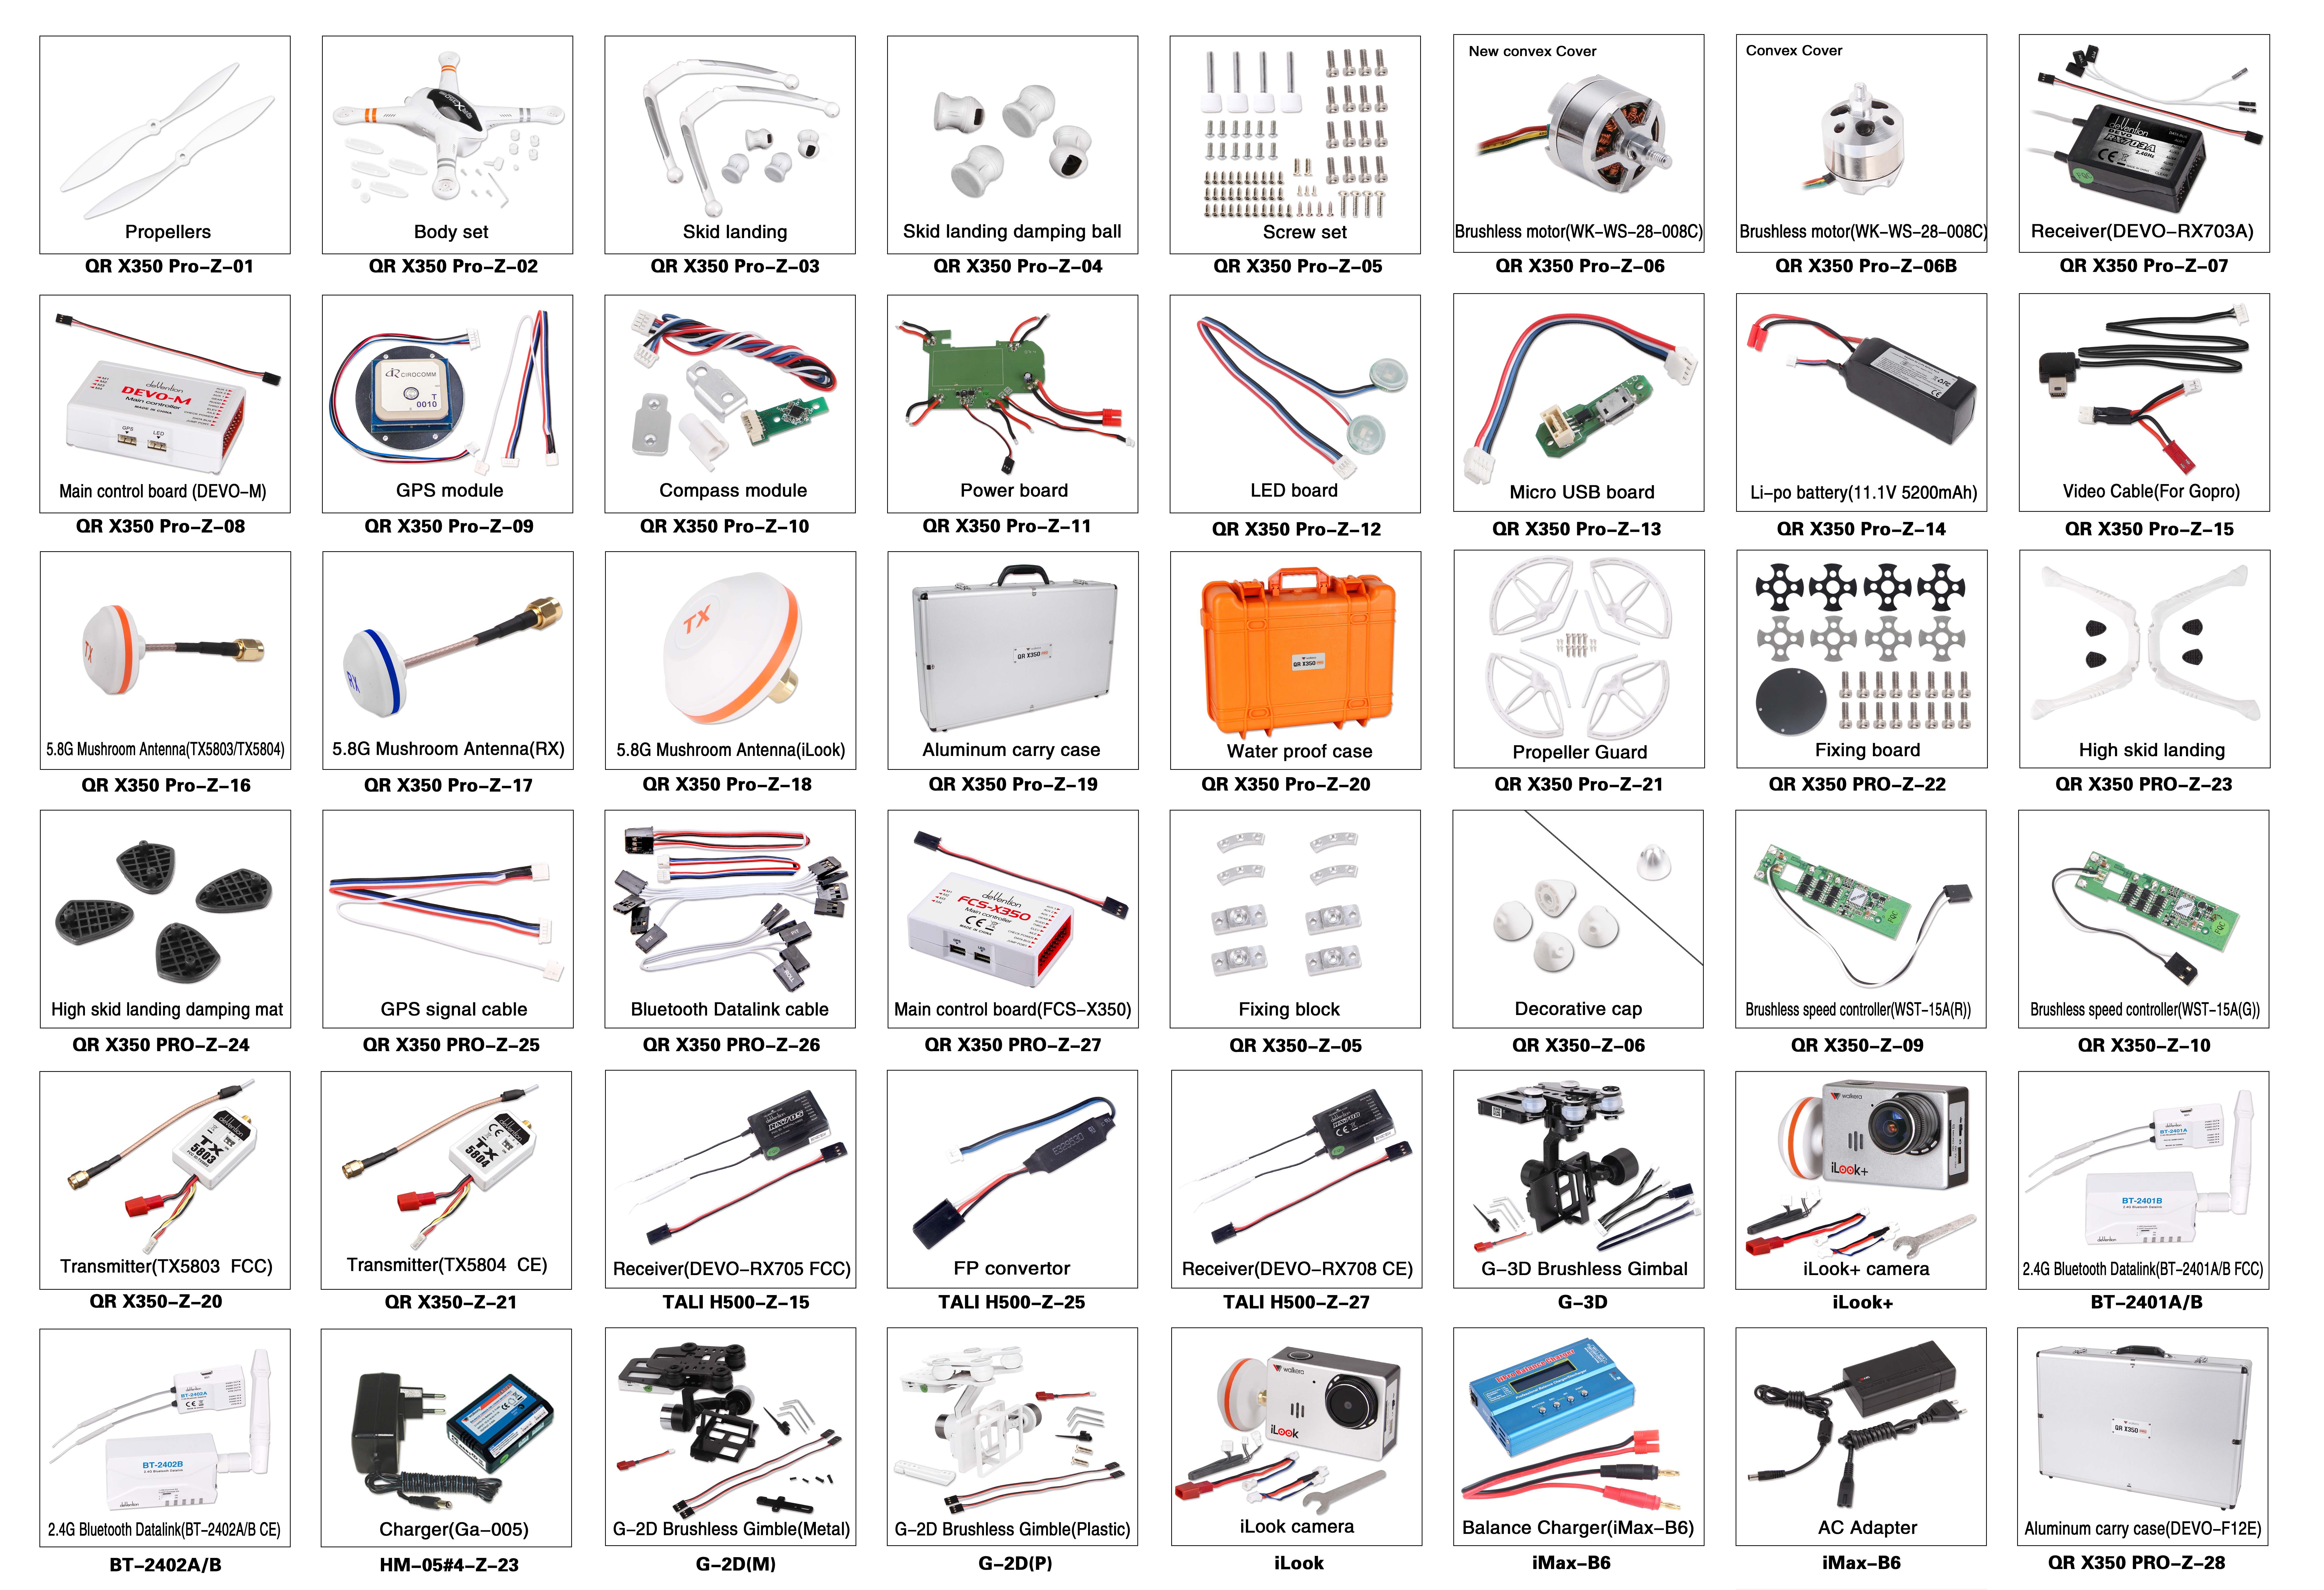 Walkera Ilook Camera Wiring Diagram on